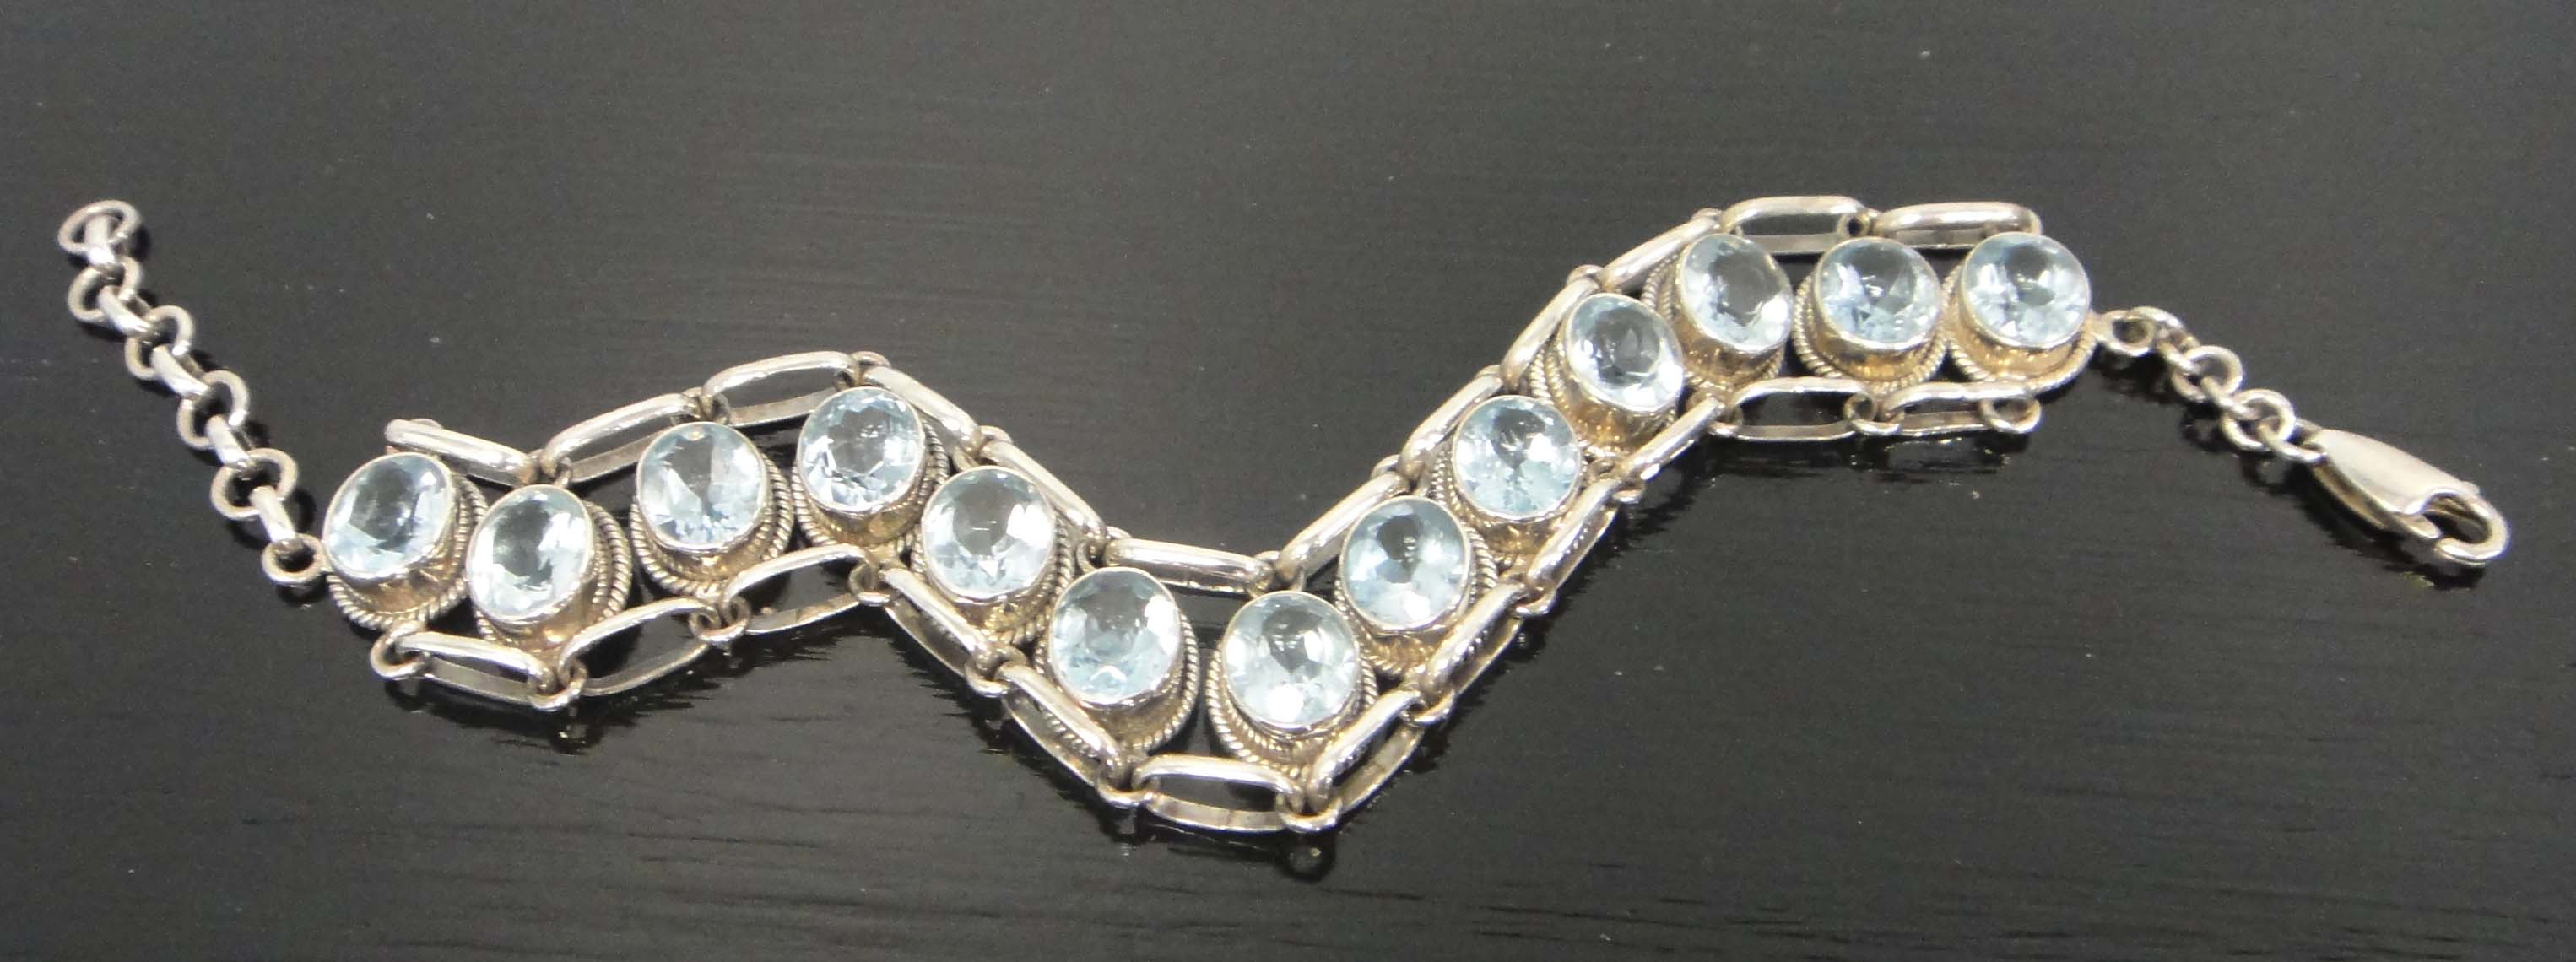 handmade blue topaz and sterling silver bracelet